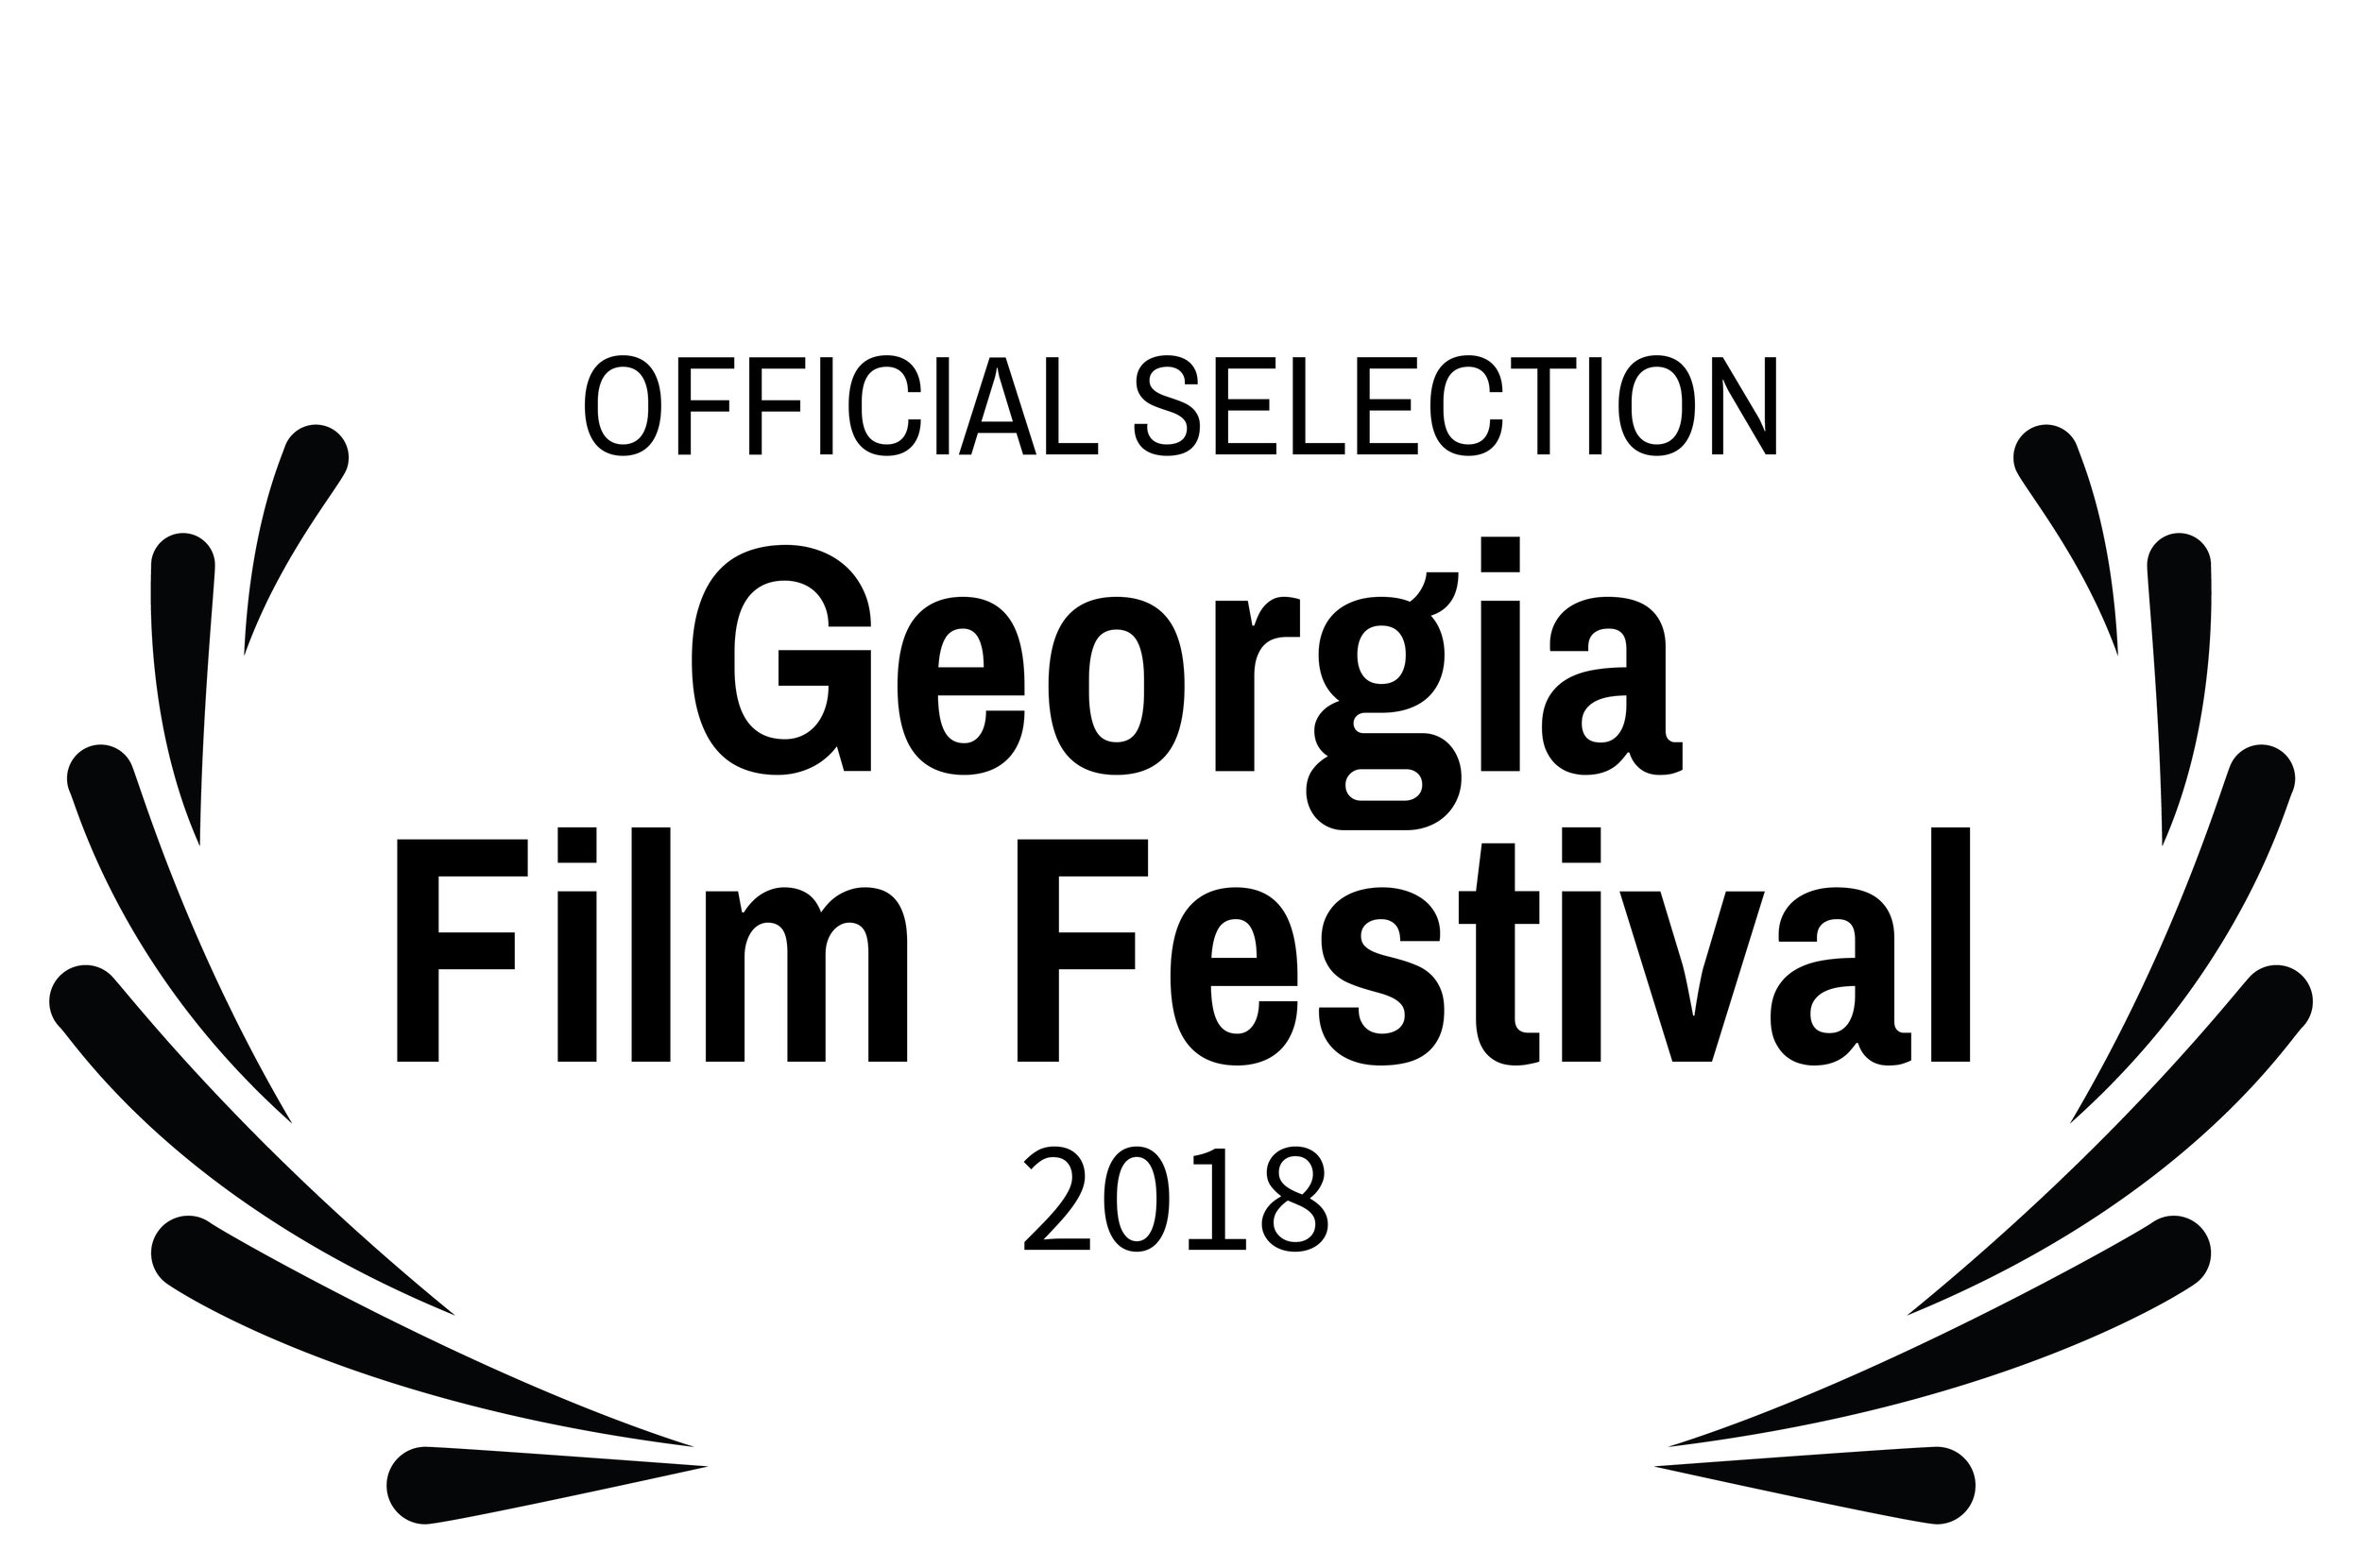 OFFICIALSELECTION-GeorgiaFilmFestival-2018.jpg